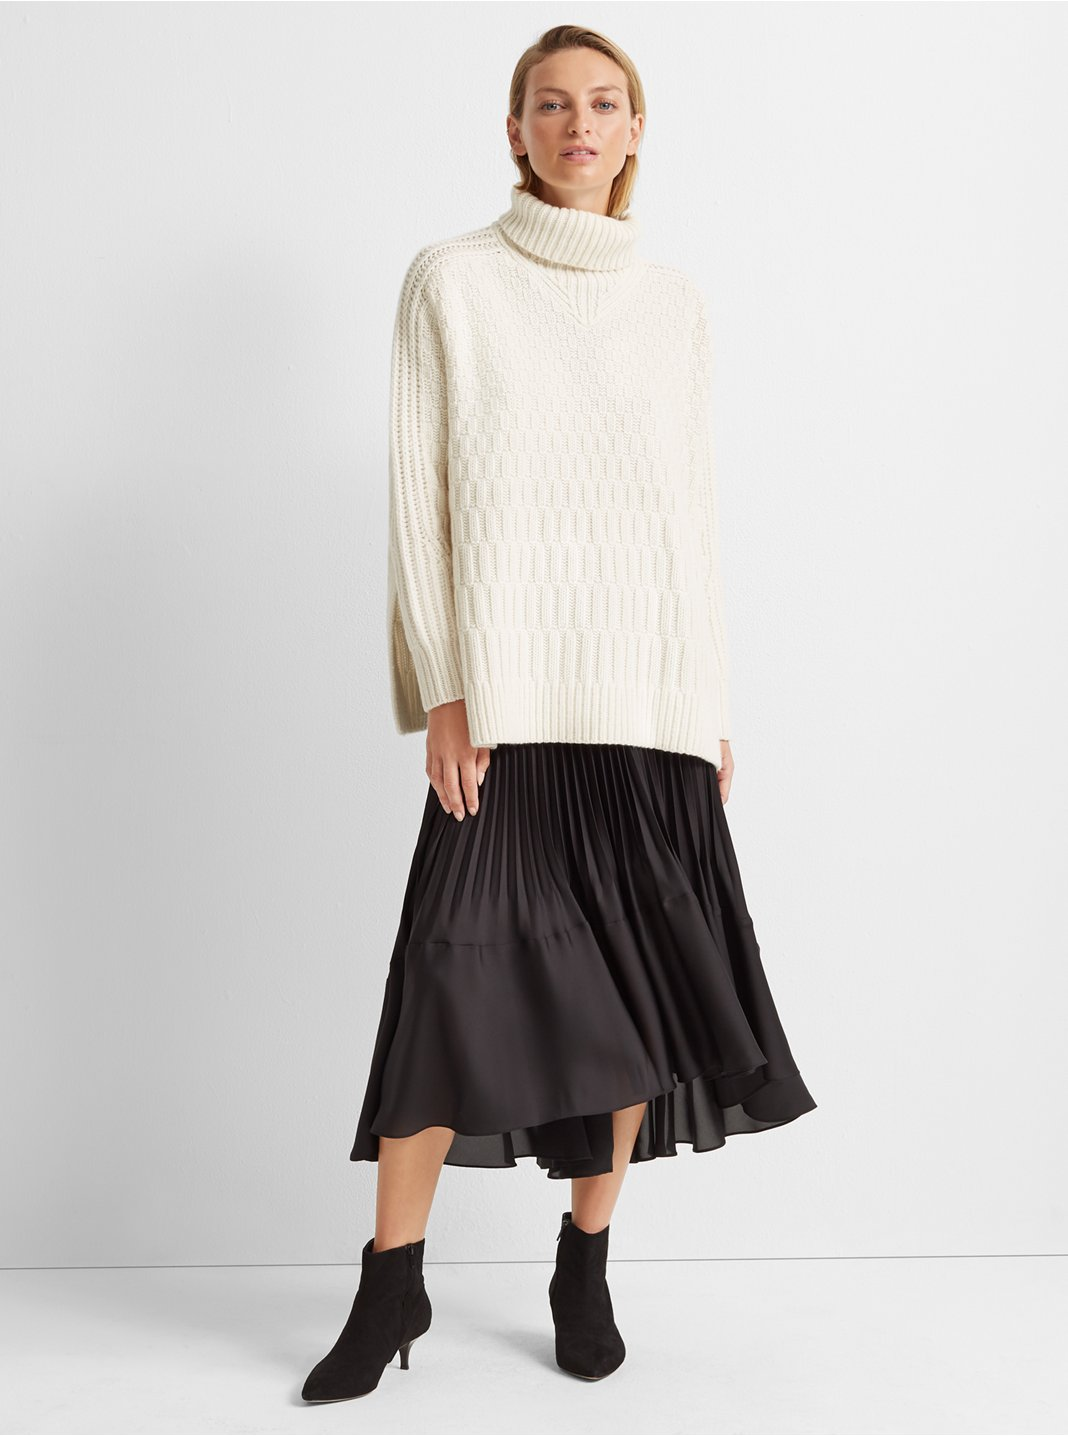 Stitch Cashmere Sweater